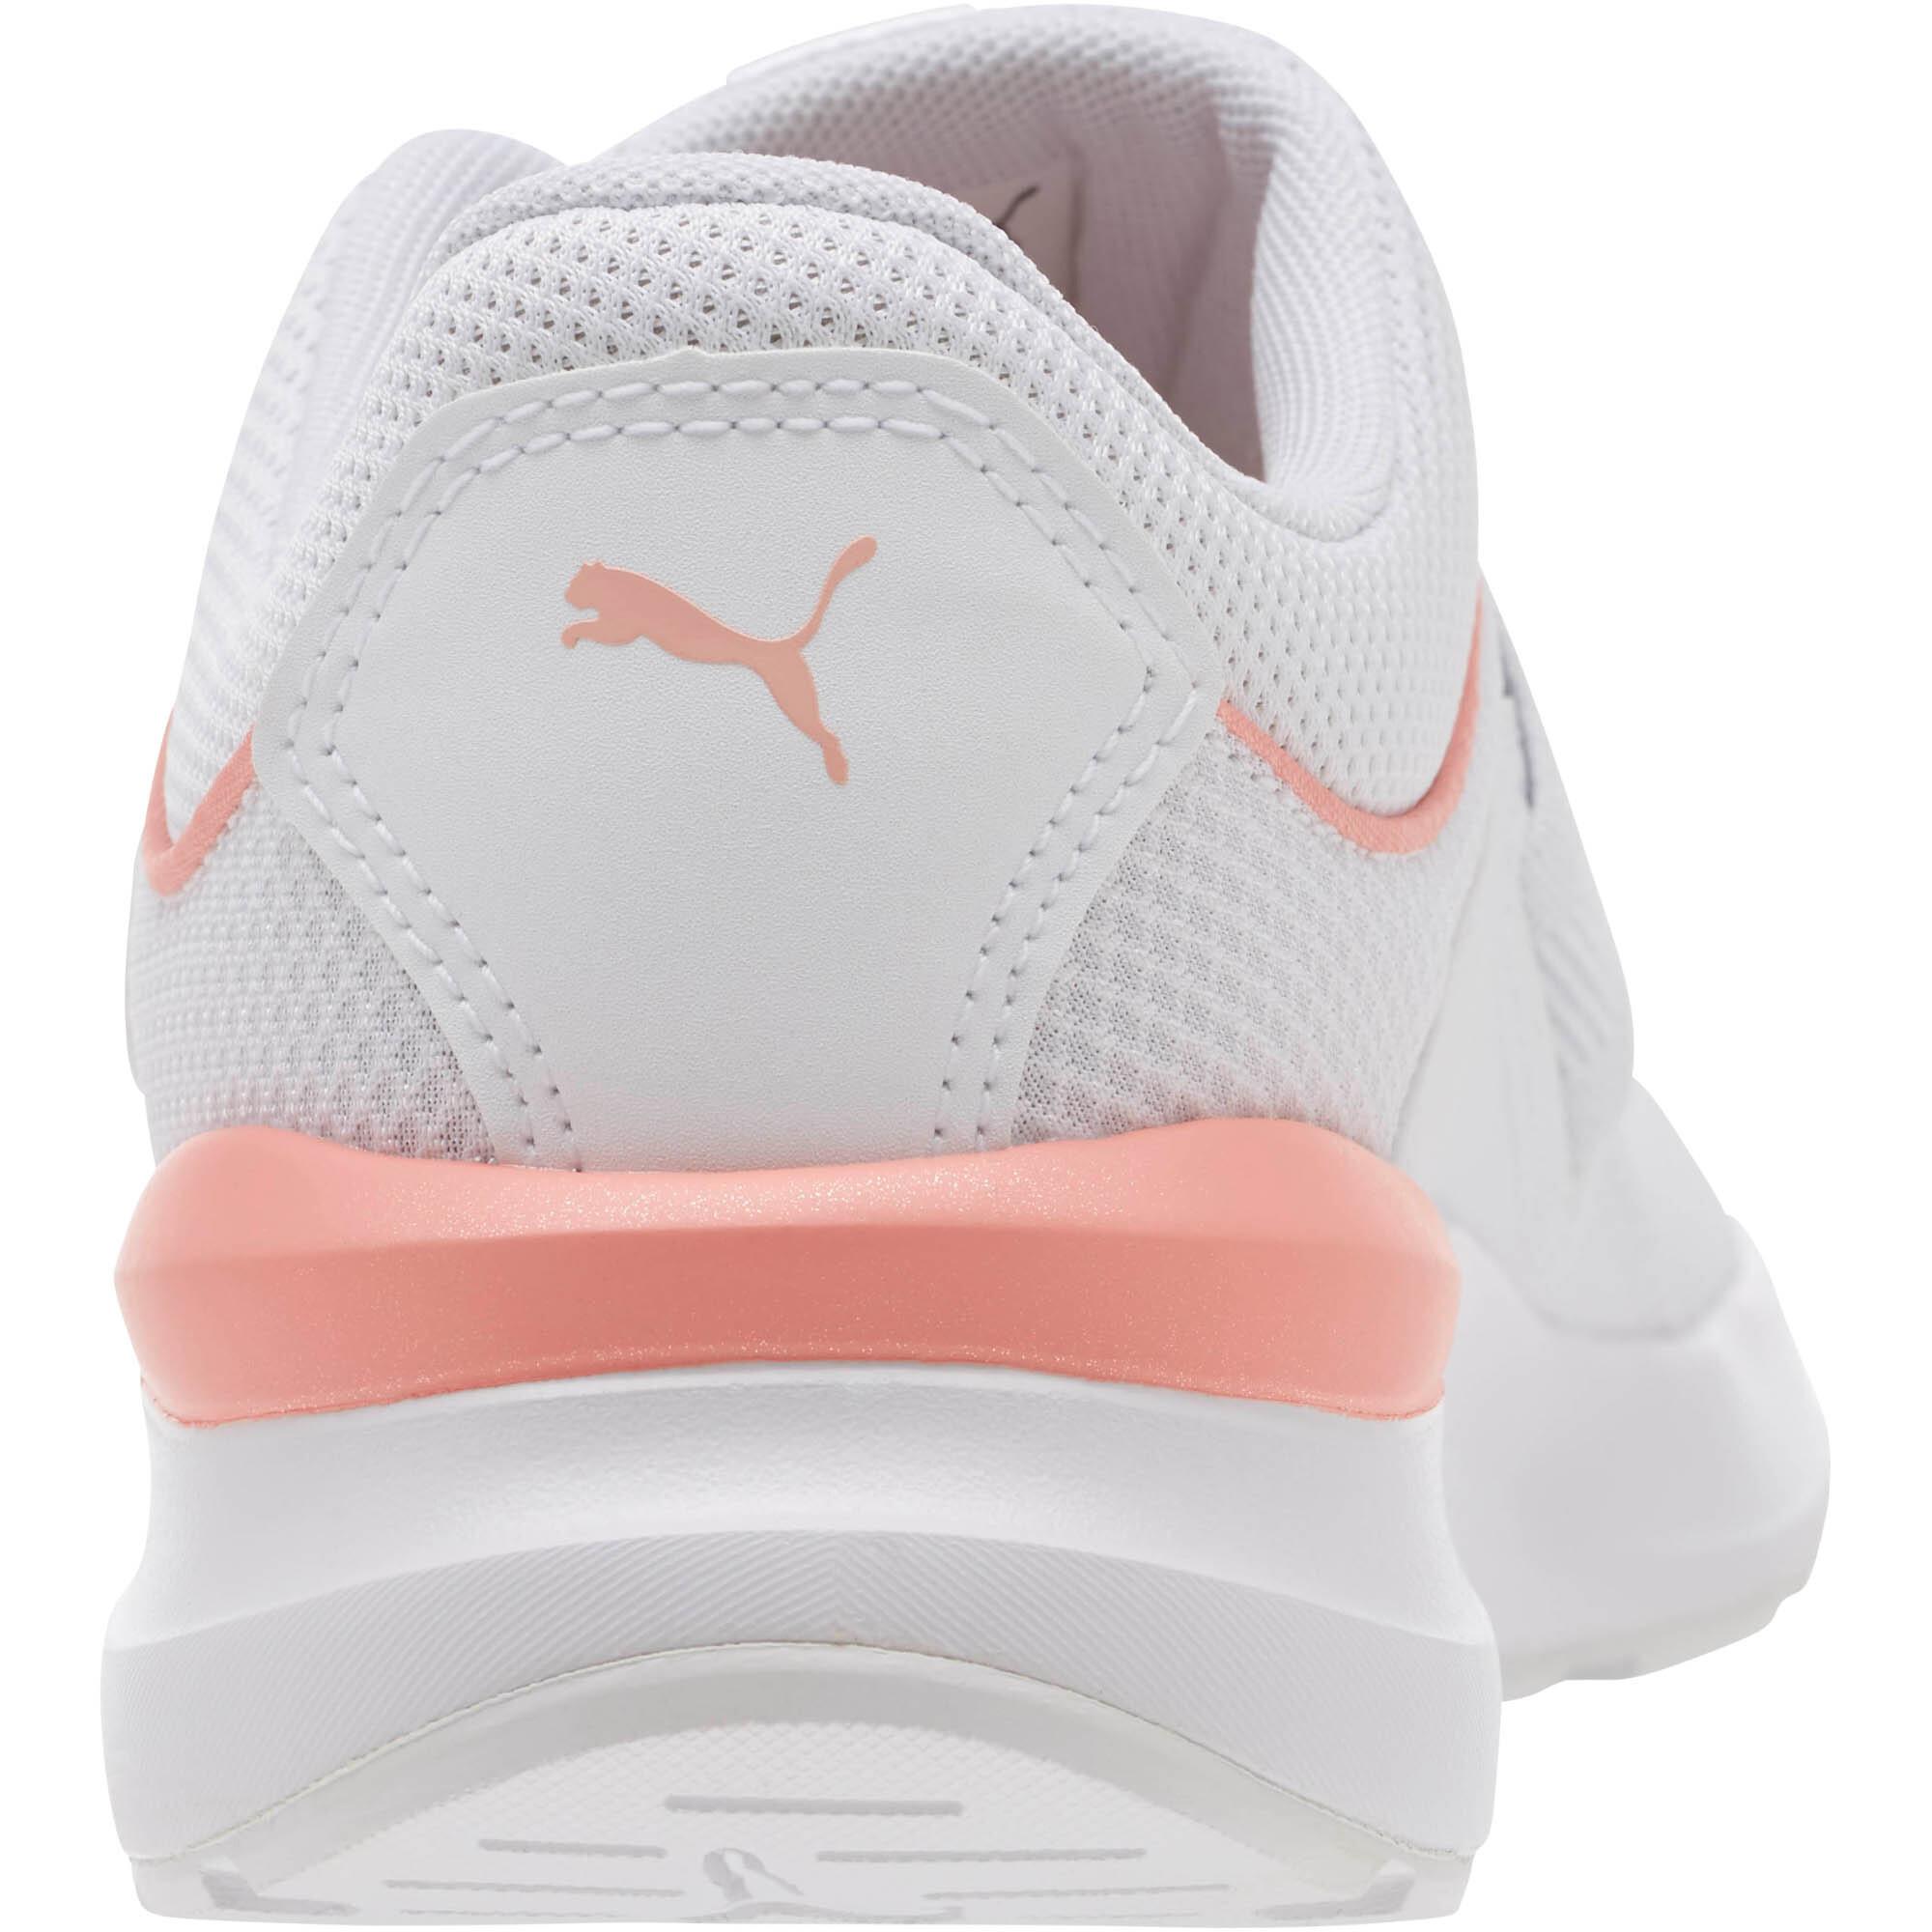 PUMA-Adela-X-Women-s-Sneakers-Women-Shoe-Basics thumbnail 15